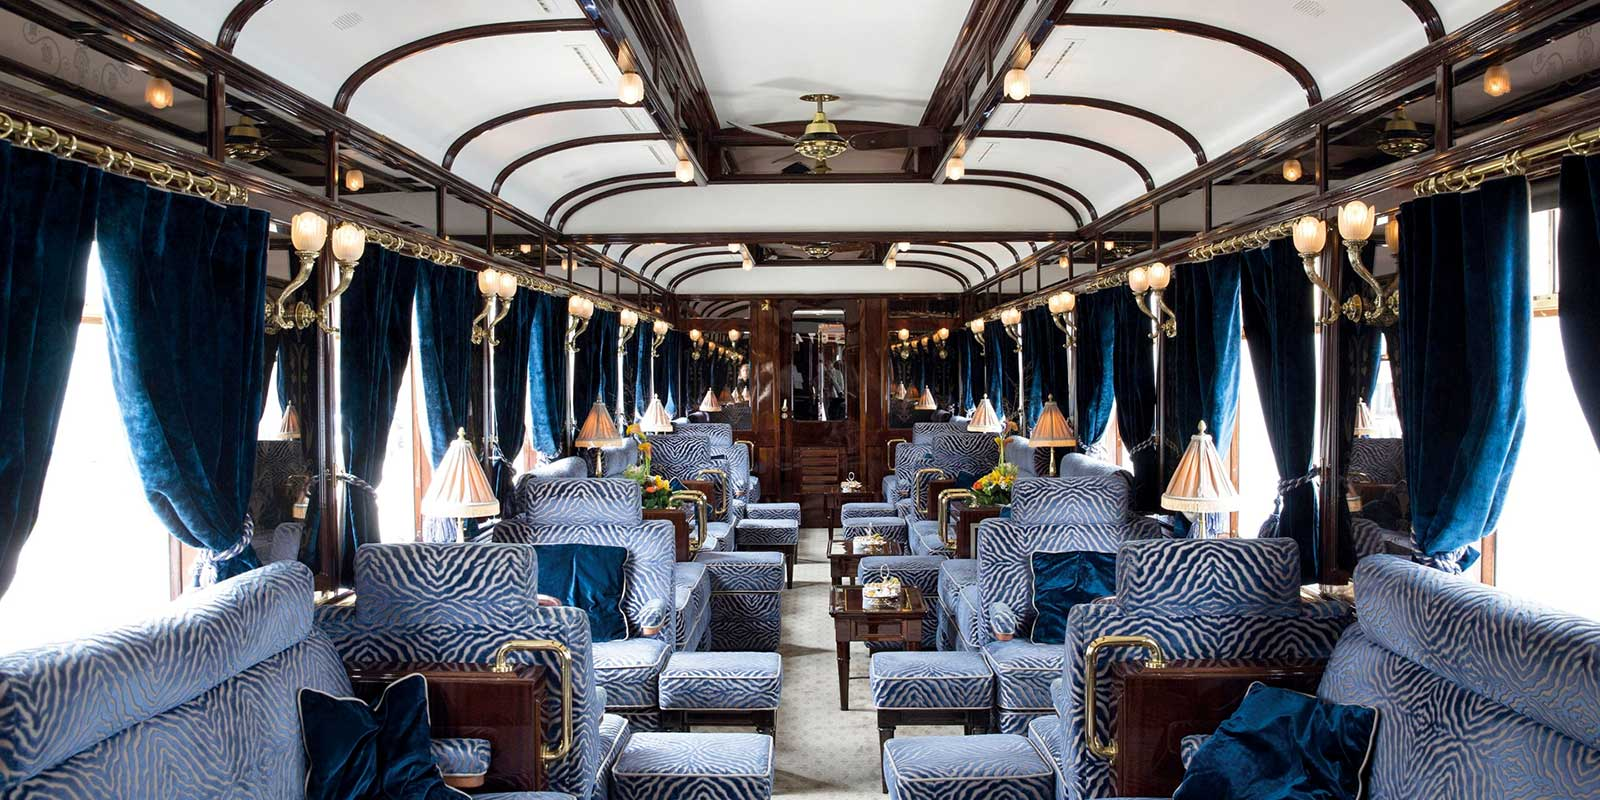 Venice Simplon Orient Express Berlin to London